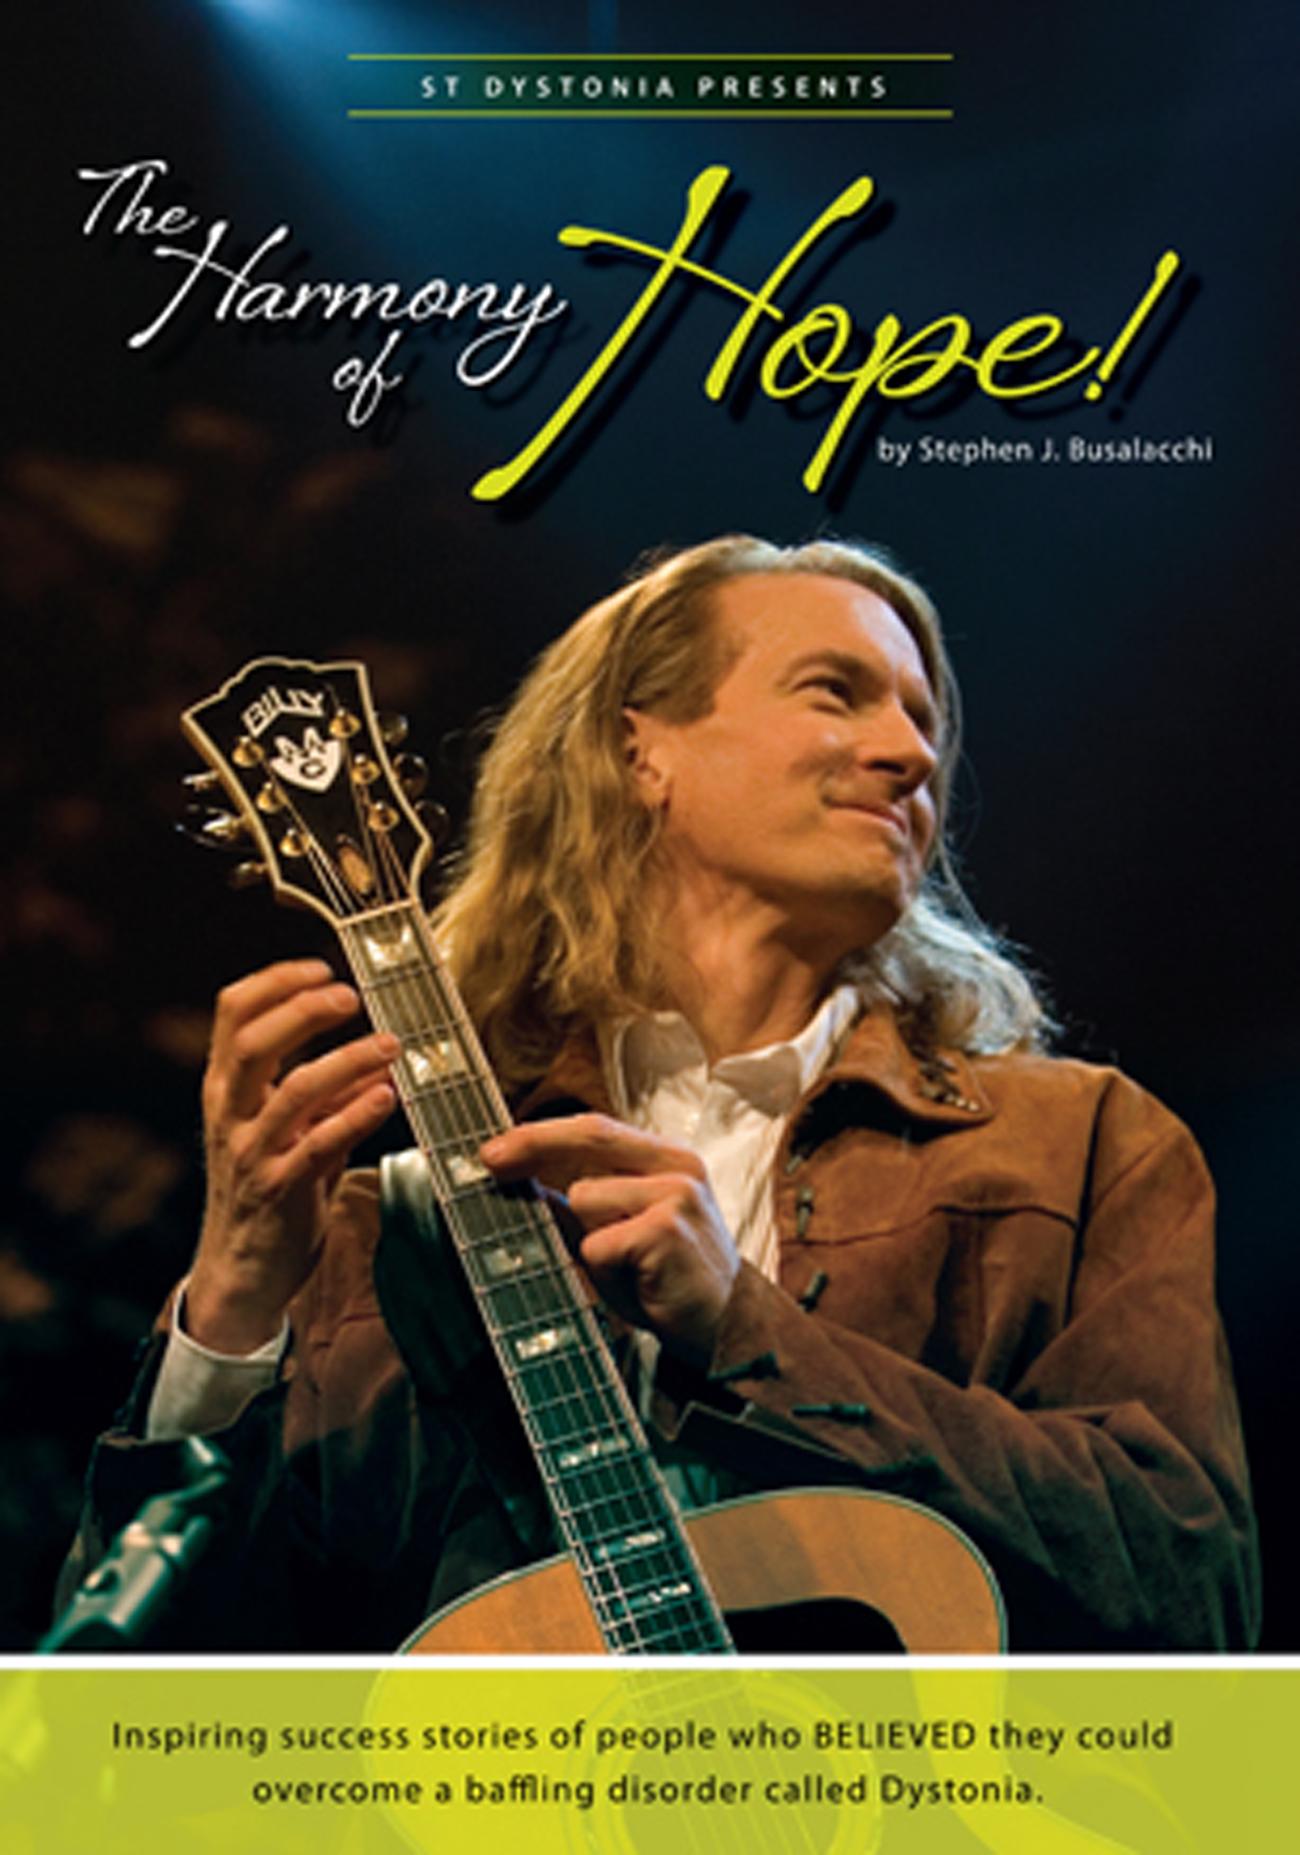 harmony of hope Stephen J Busalacchi